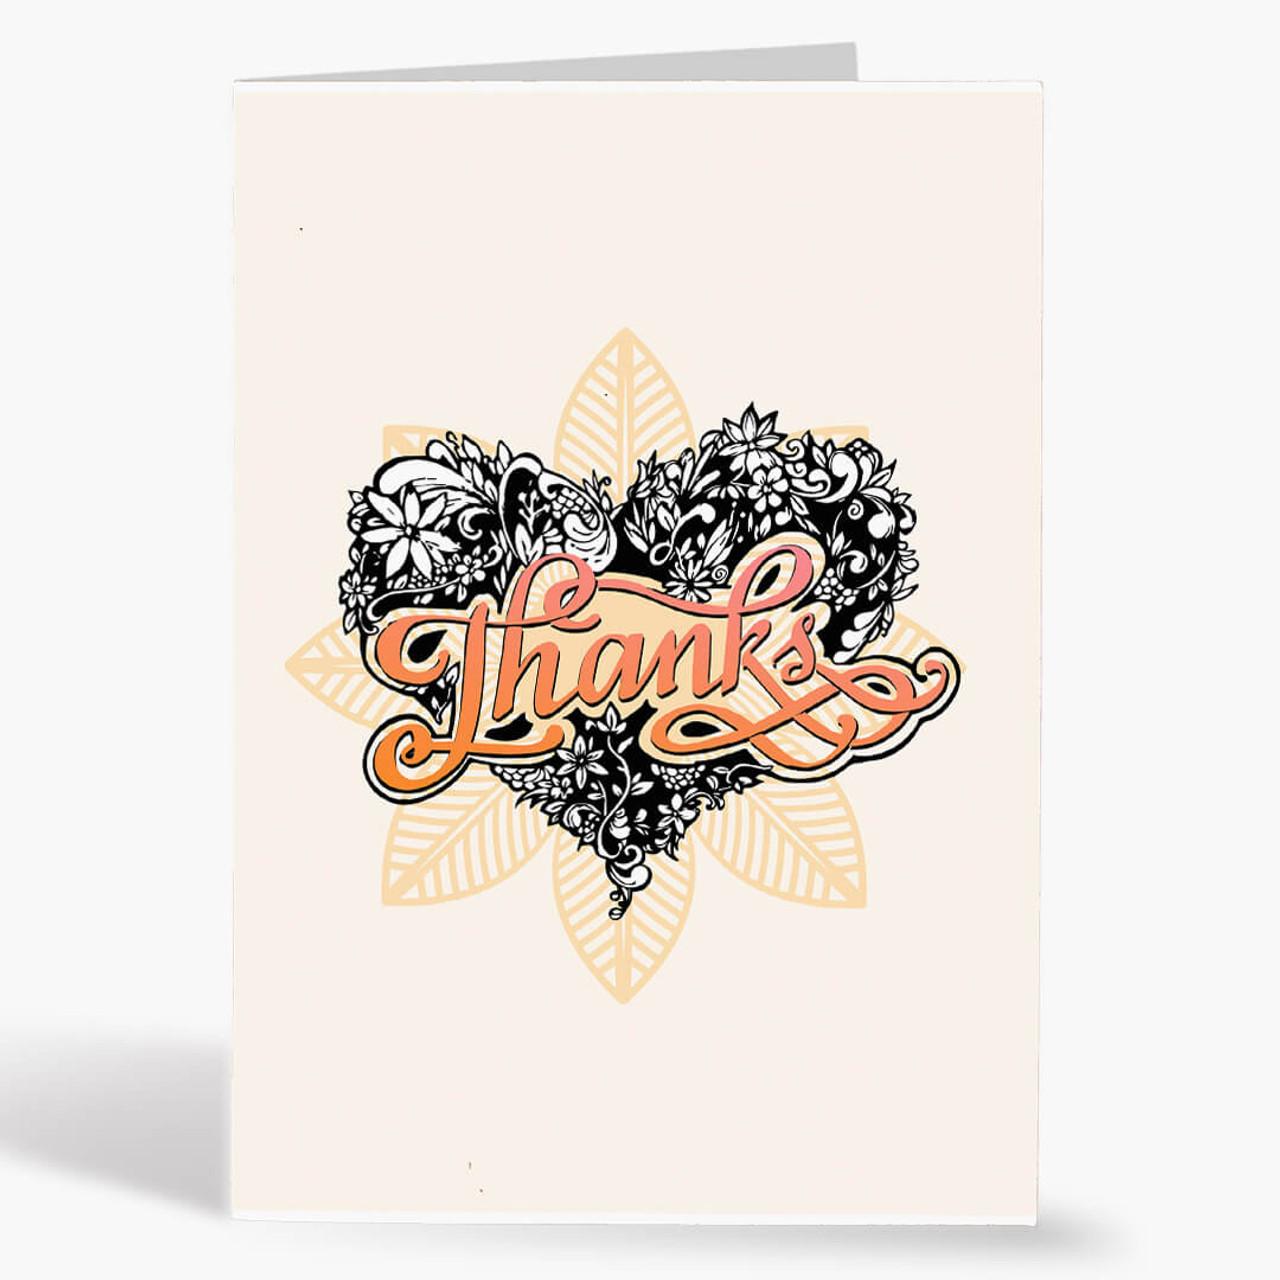 Thank You - Tattooed Heart 2 Card